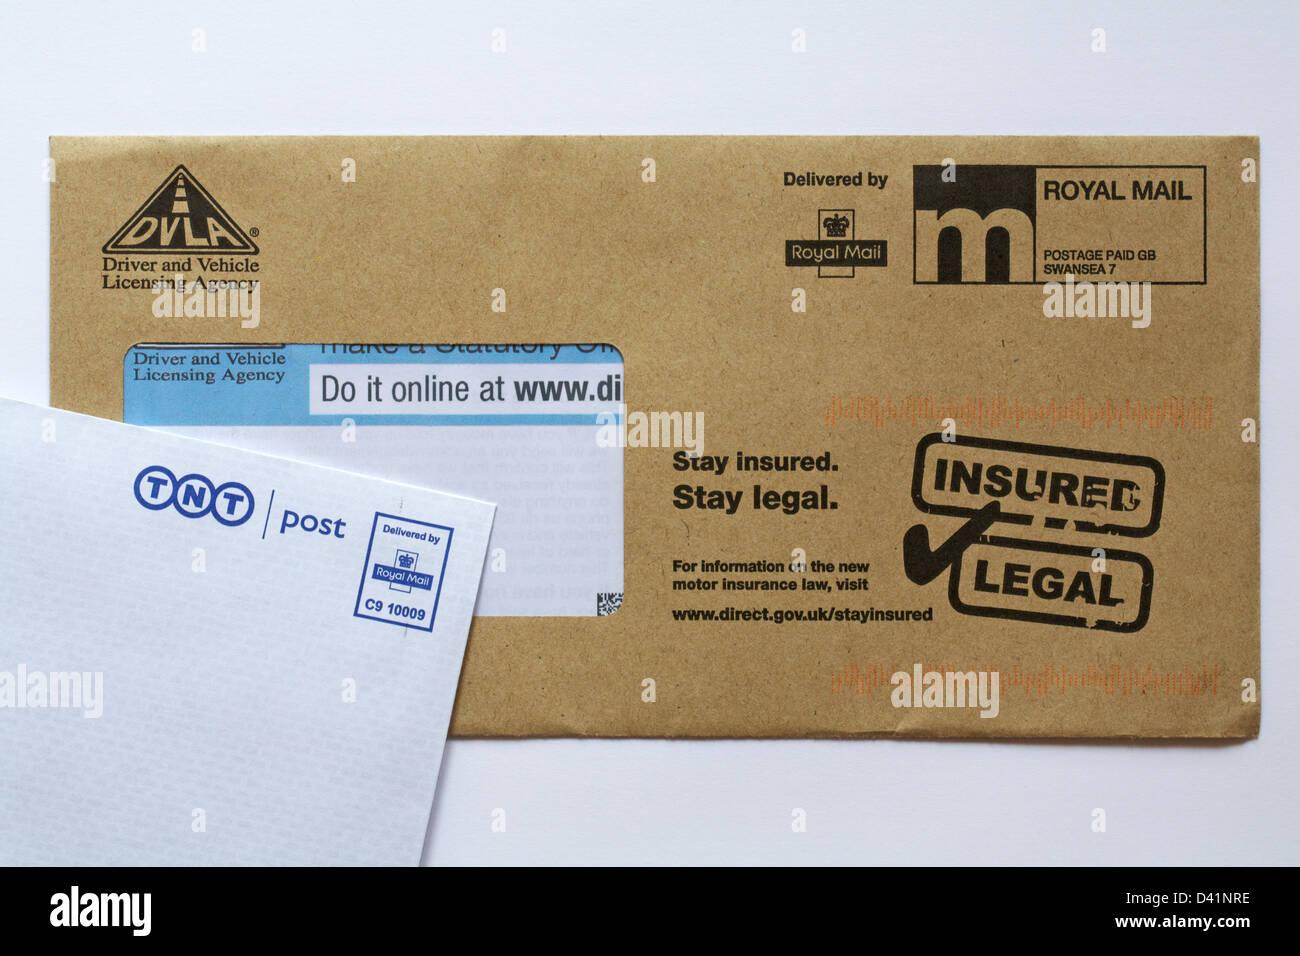 DVLA car tax renewal post - Stock Image